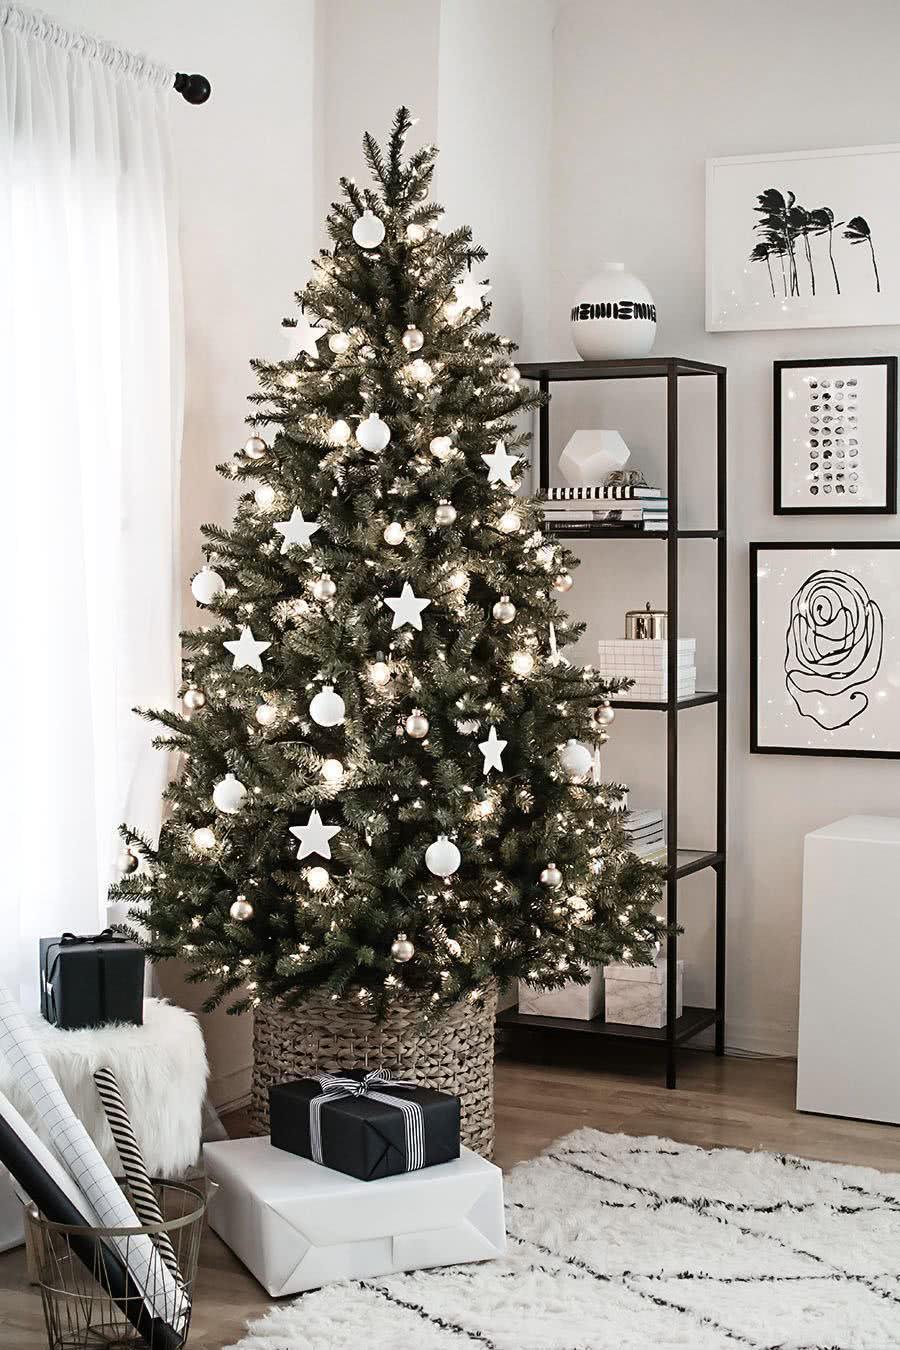 Árvore de Natal pronta para decorar sua sala de estar.